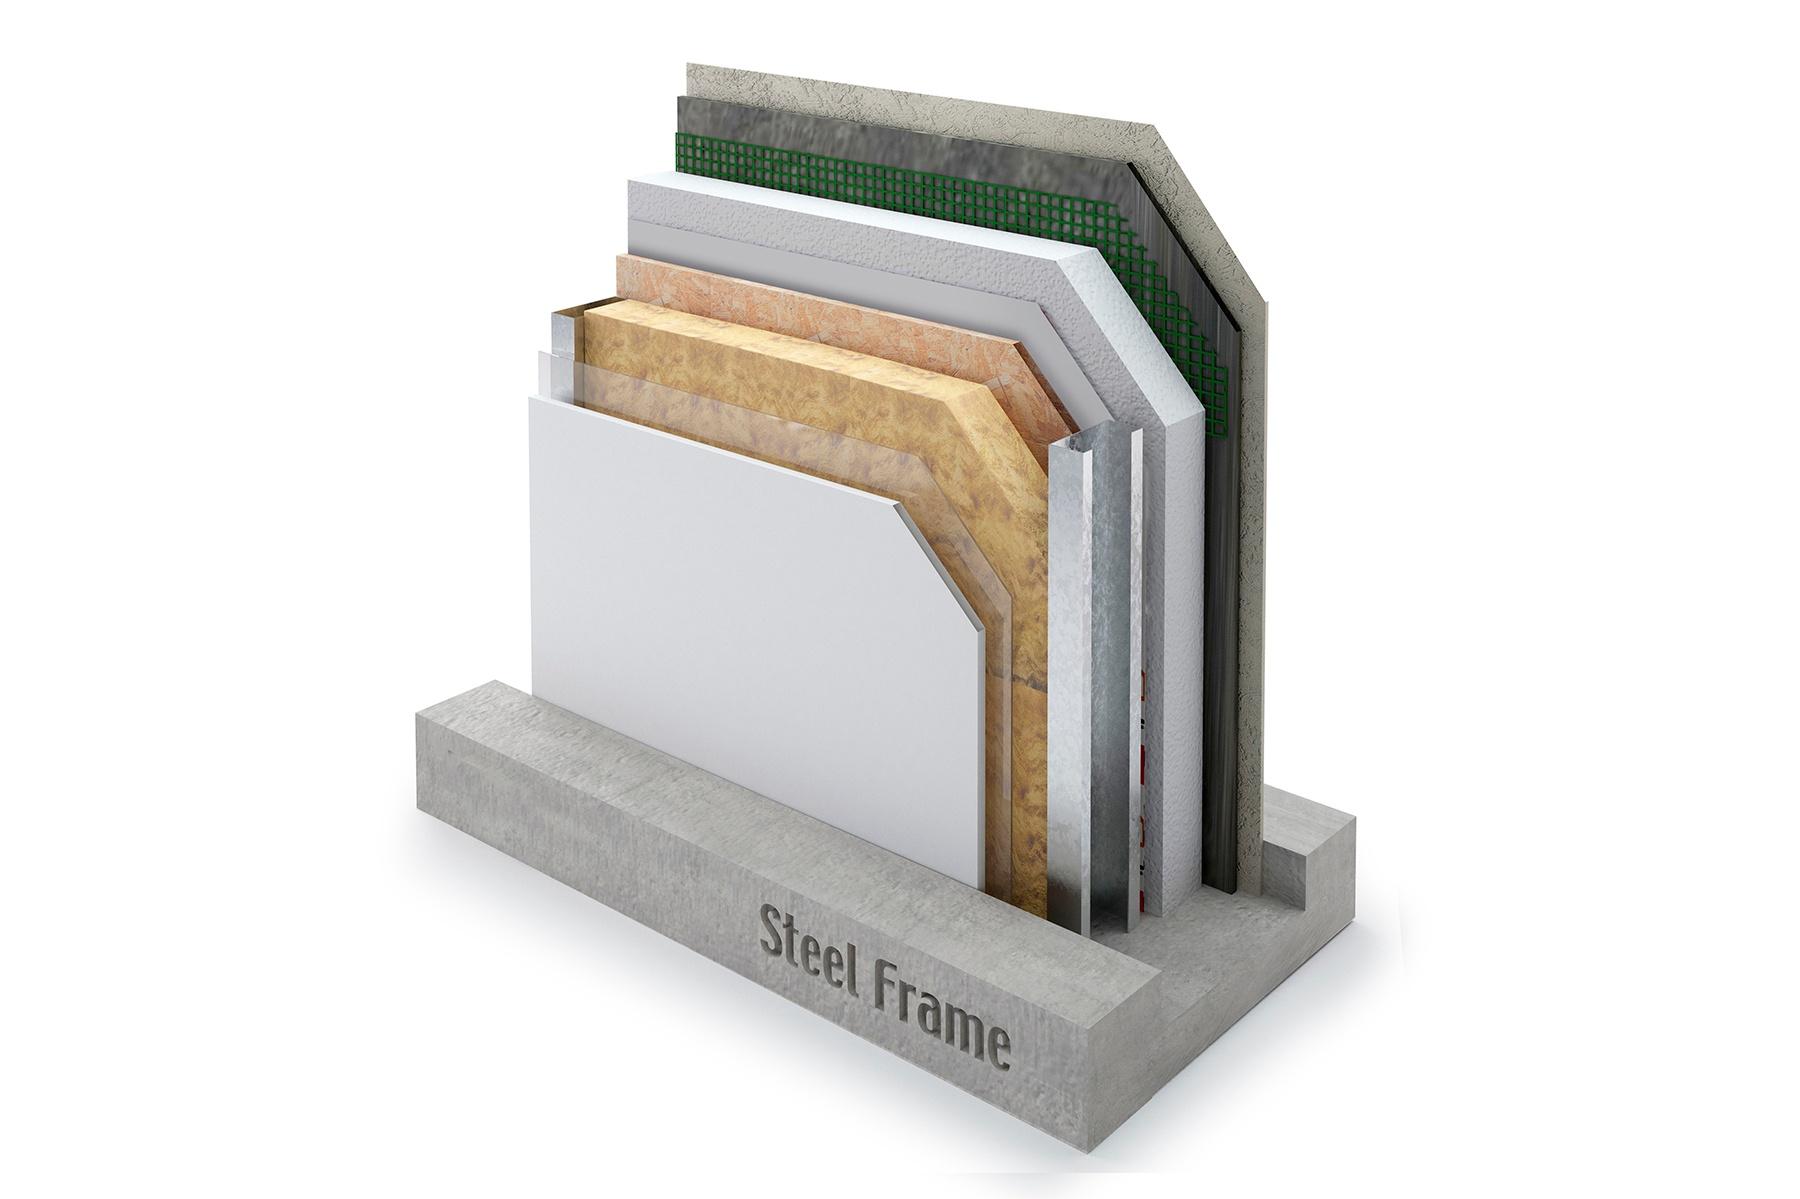 post-aislacion-steel-framing